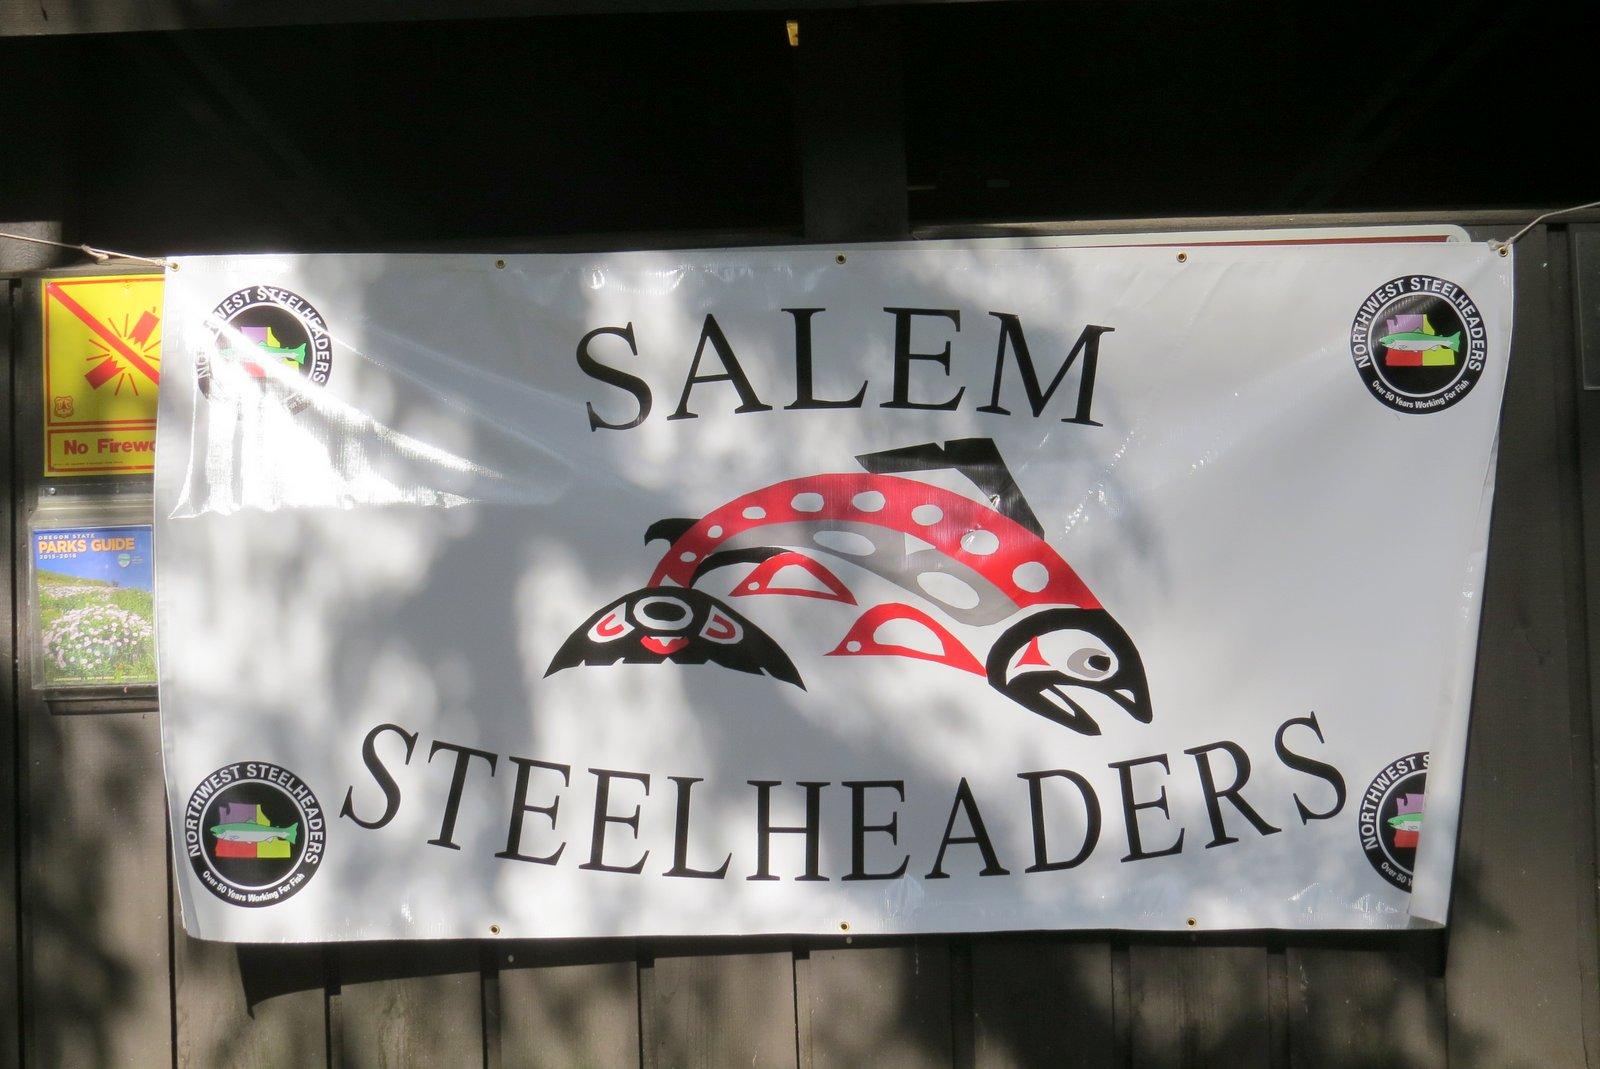 Salem Steelhead Banner sign